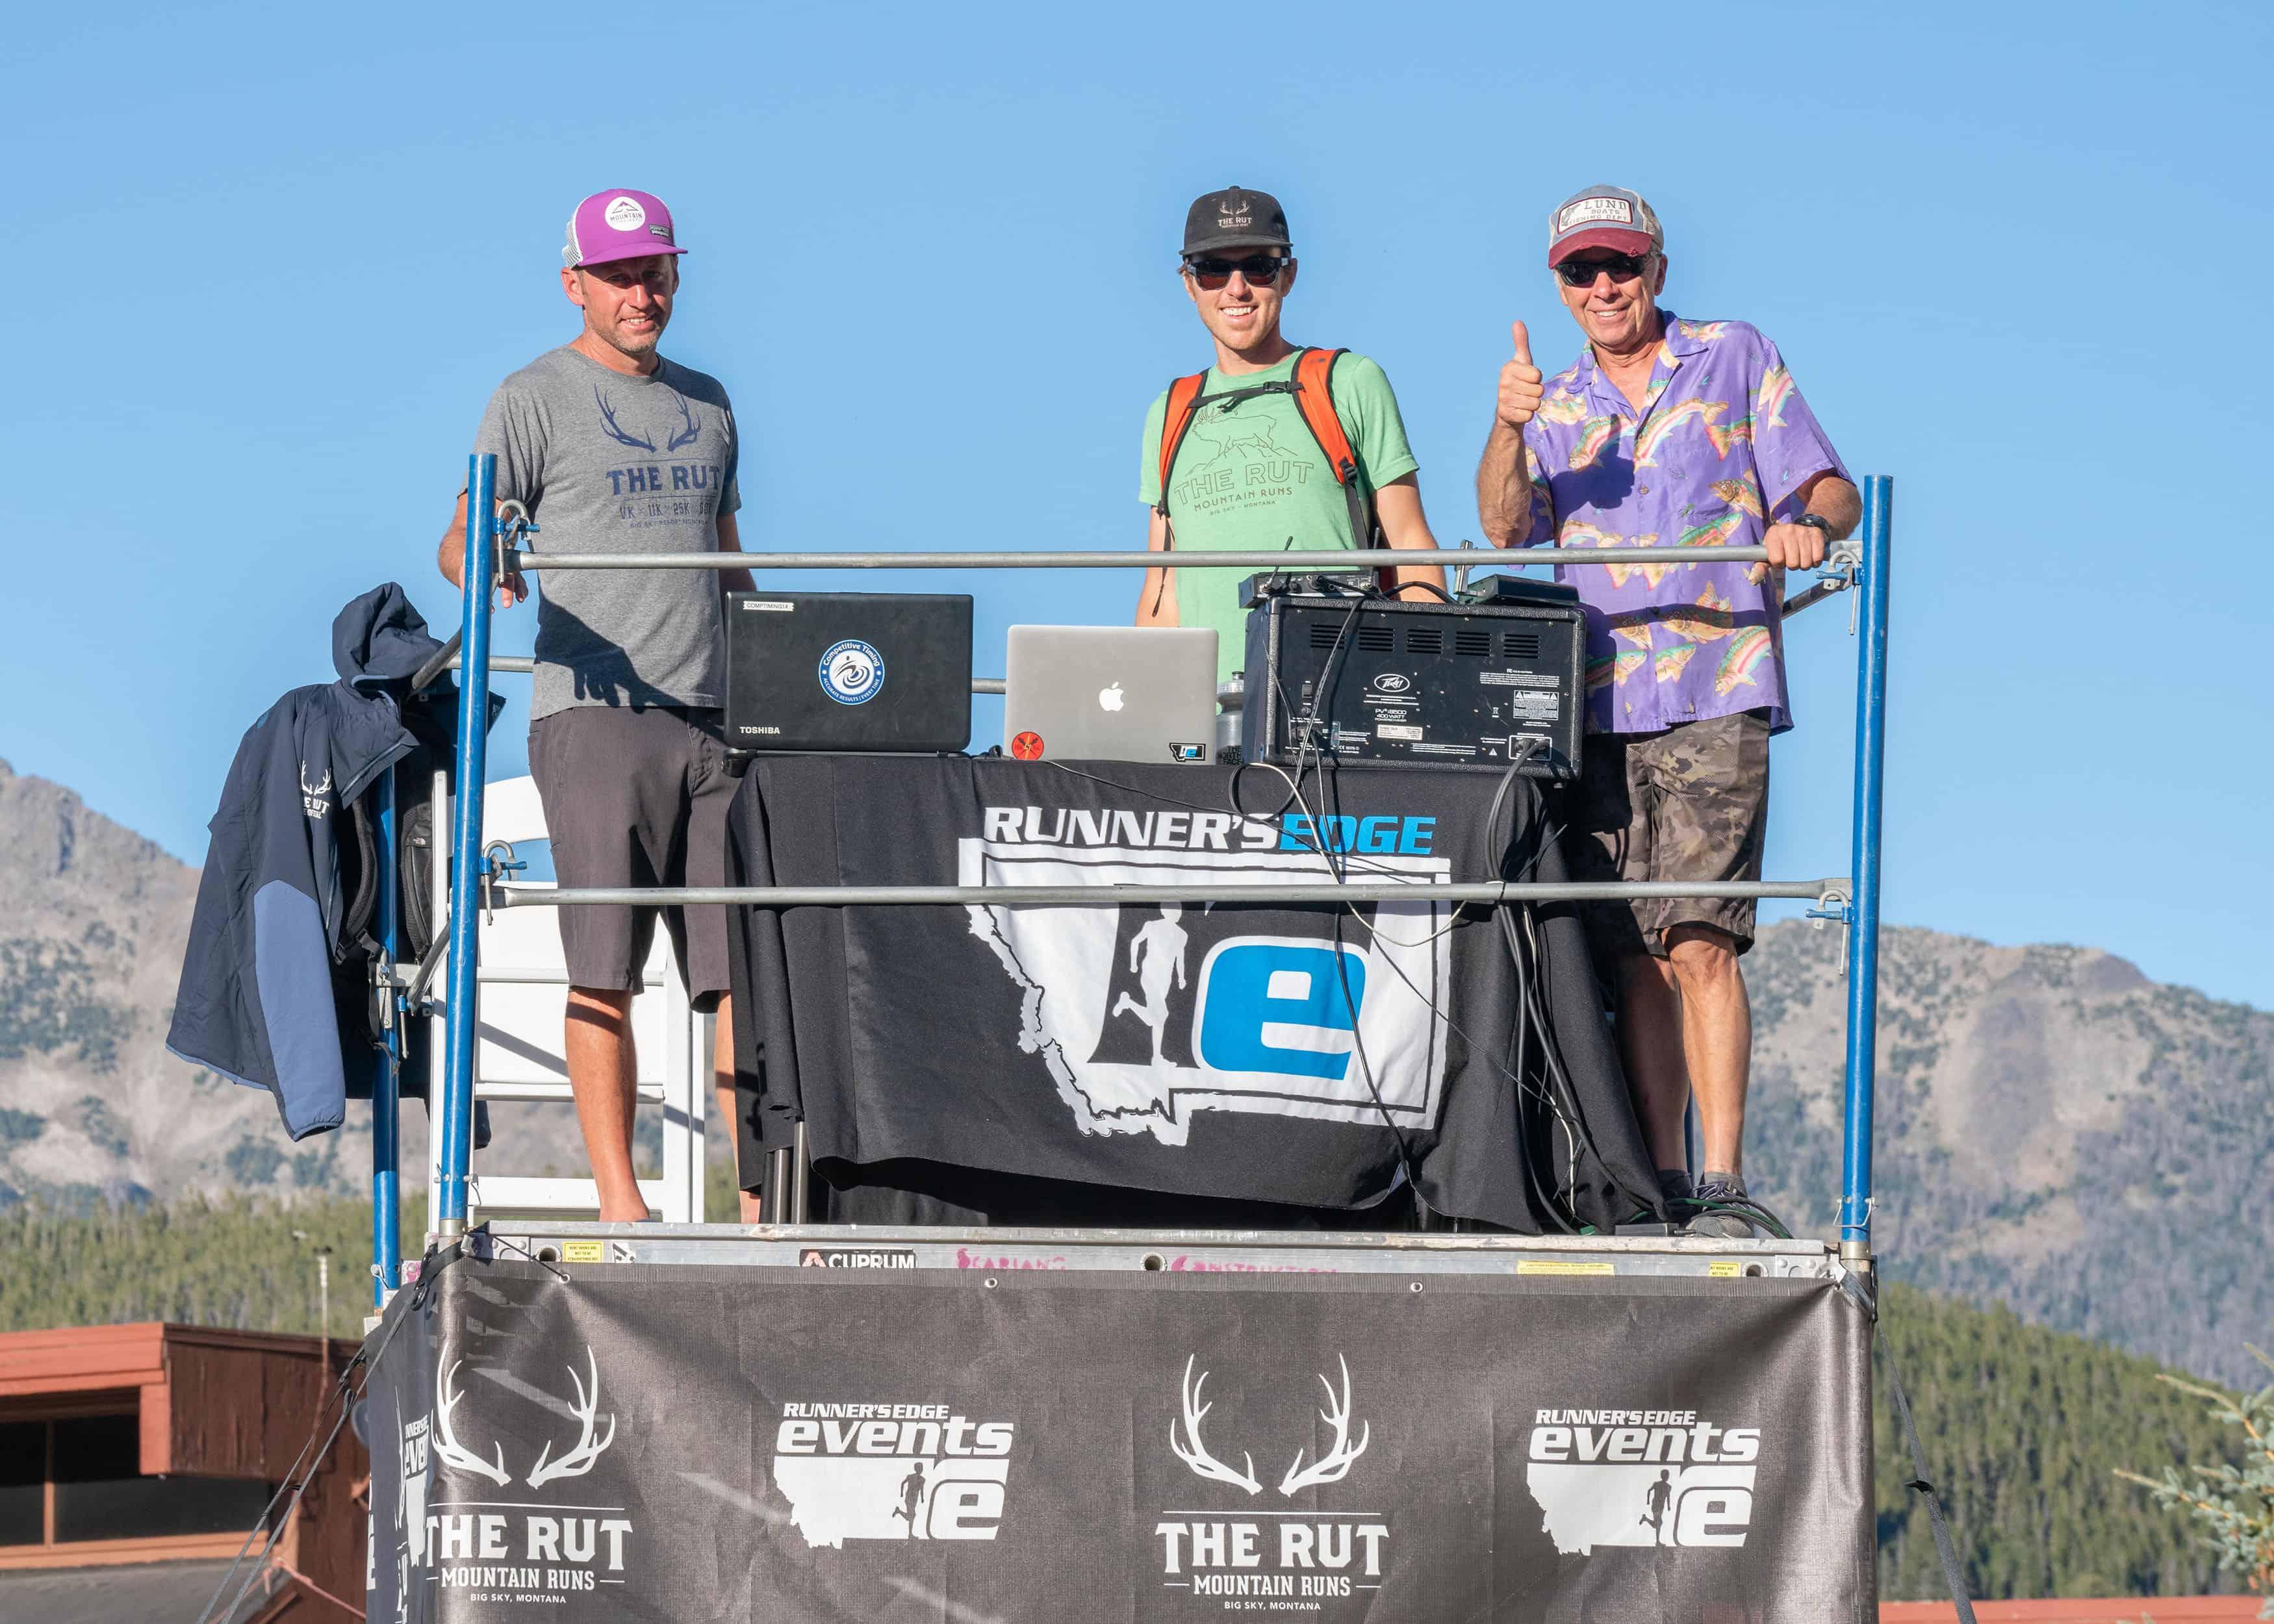 The 2018 Rut Mountain Runs - www.runtherut.com